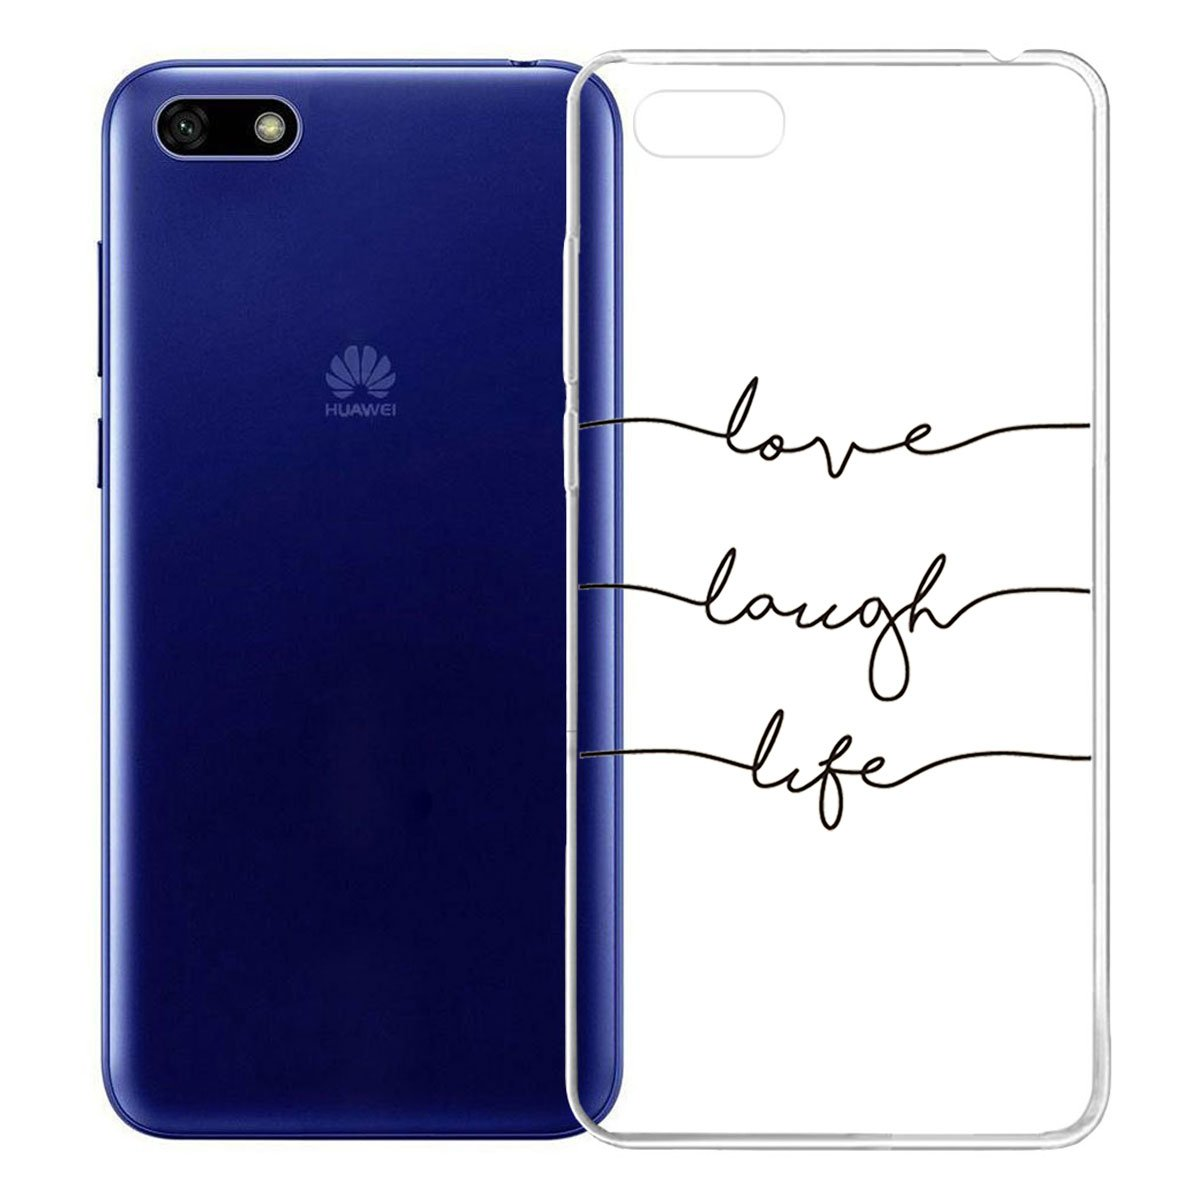 Honor 7s Huawei Y5 Prime 2018 Honor 7s Huawei Y5 Prime 2018 5.45 IJIA Case Funda para Huawei Y5 2018 Transparente Sencillo pausas Musicales TPU Silicona Suave Cover Tapa Caso Parachoques Carcasa Cubierta para Huawei Y5 2018